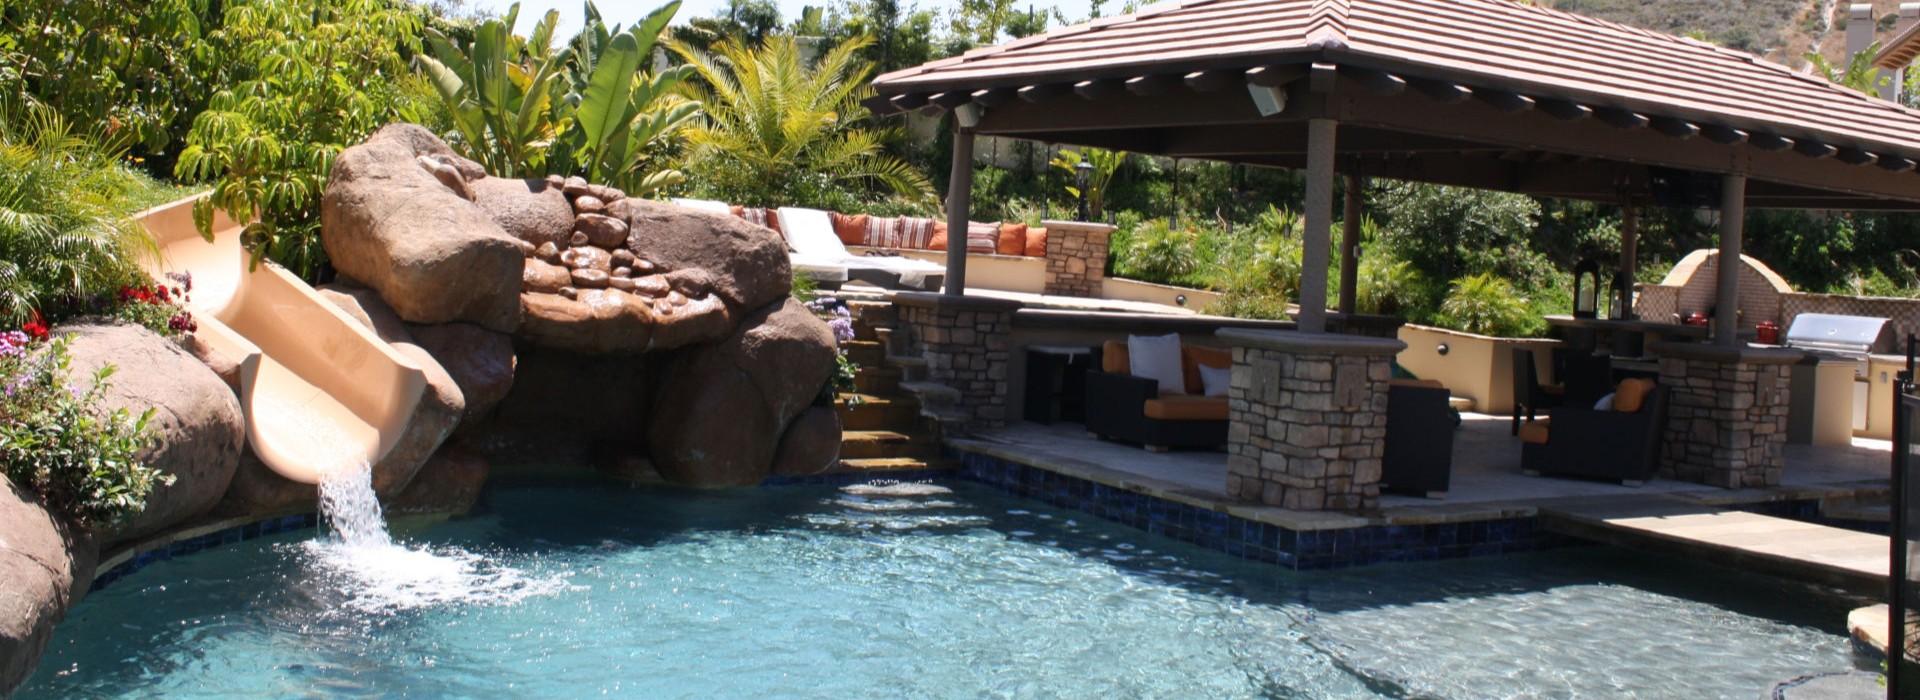 upscale-casual-backyard-resort-banner-2